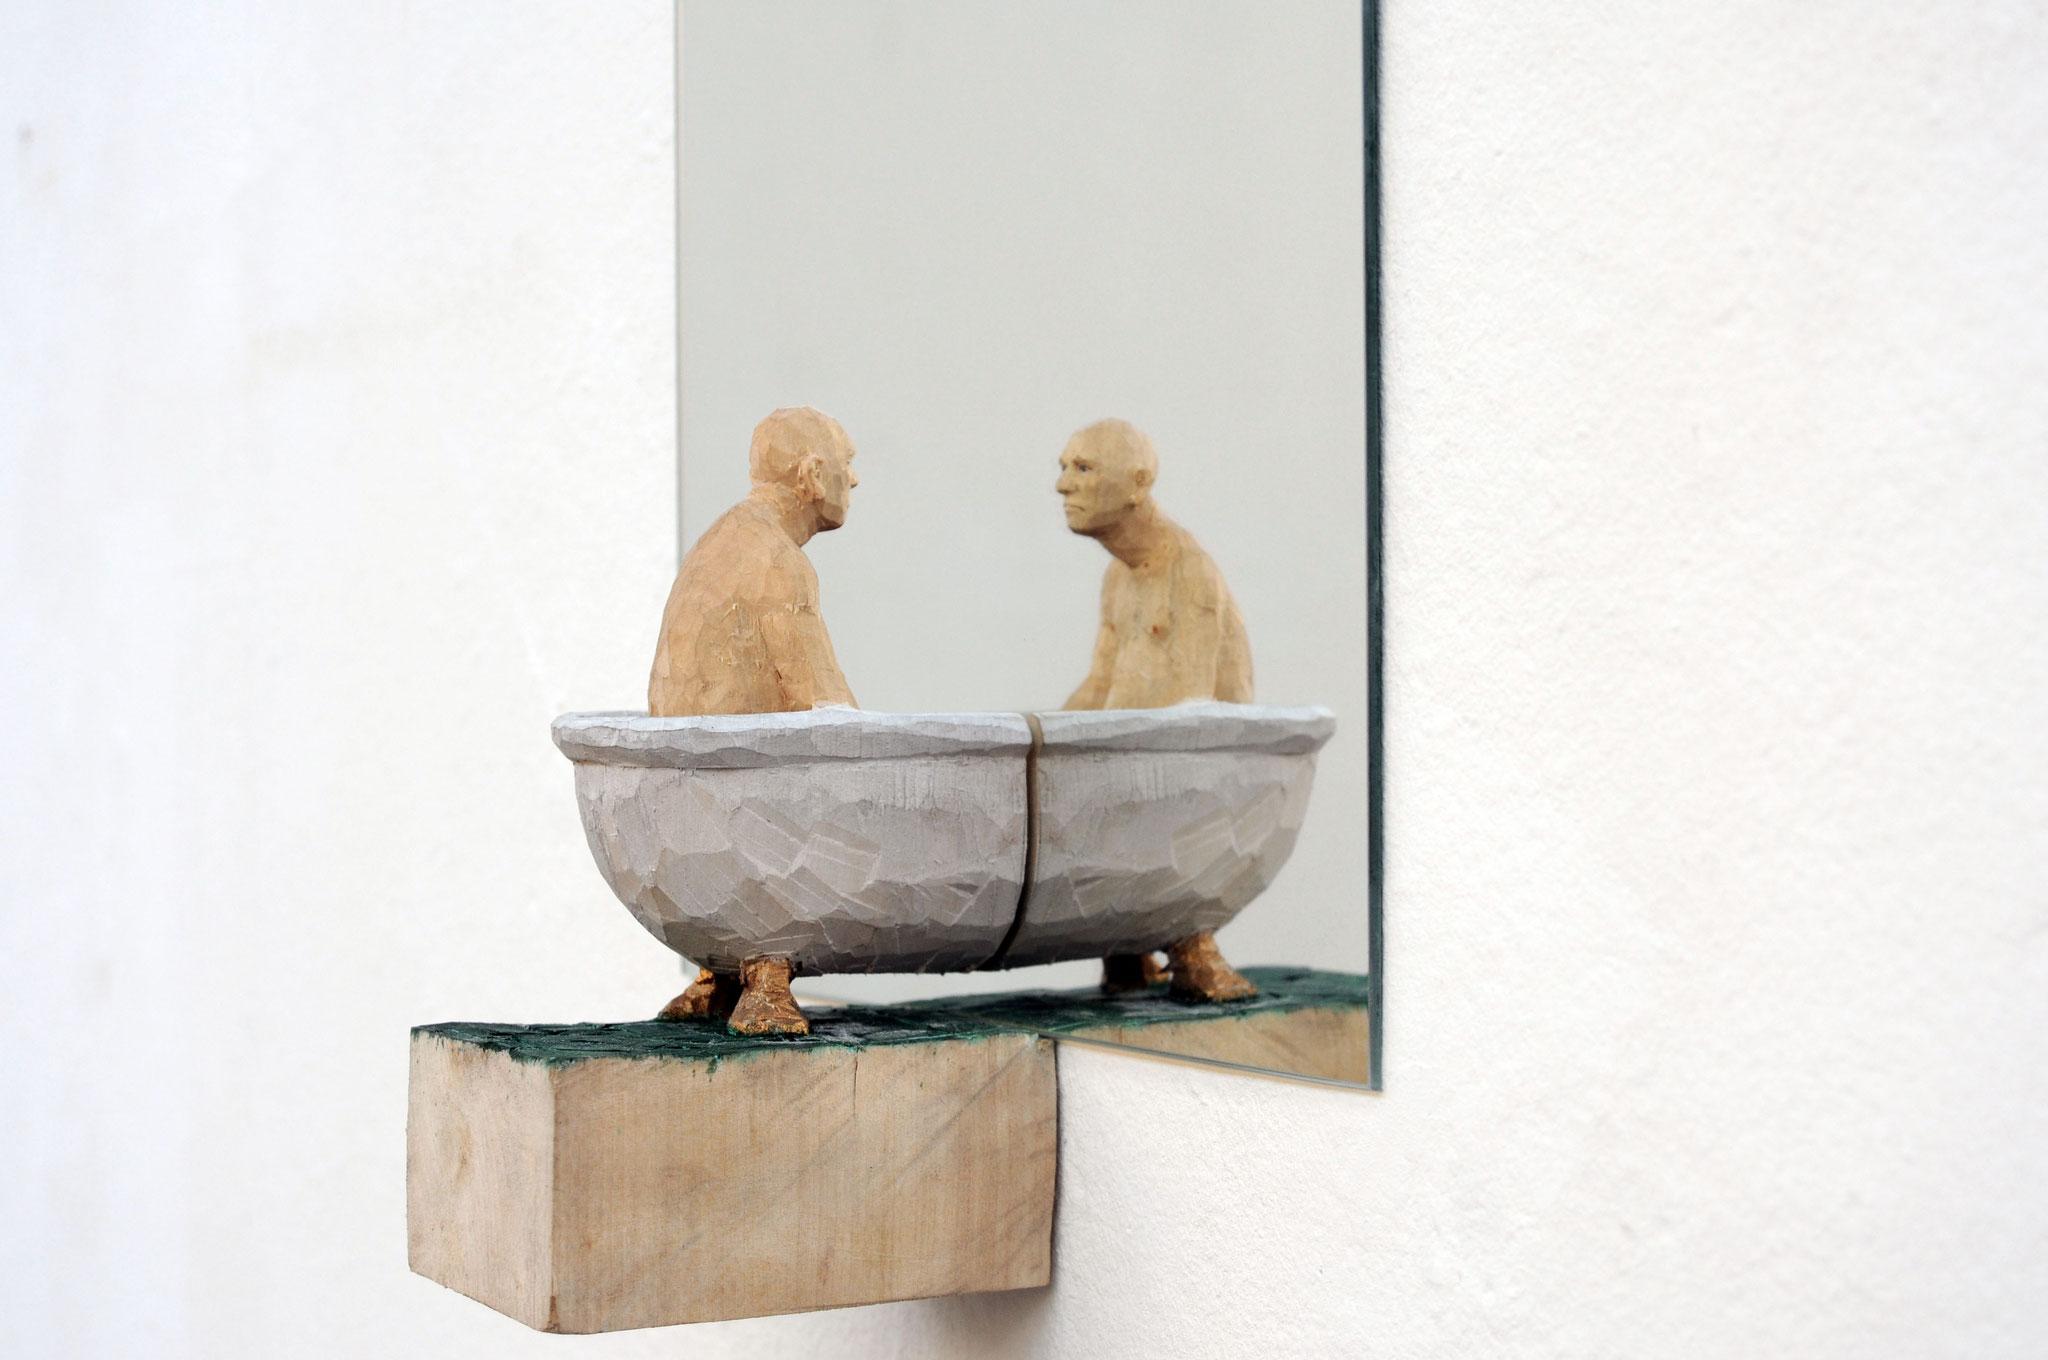 Spiegelkomposition 6  I  Lindenholz, Farbe, Spiegel  I  2017